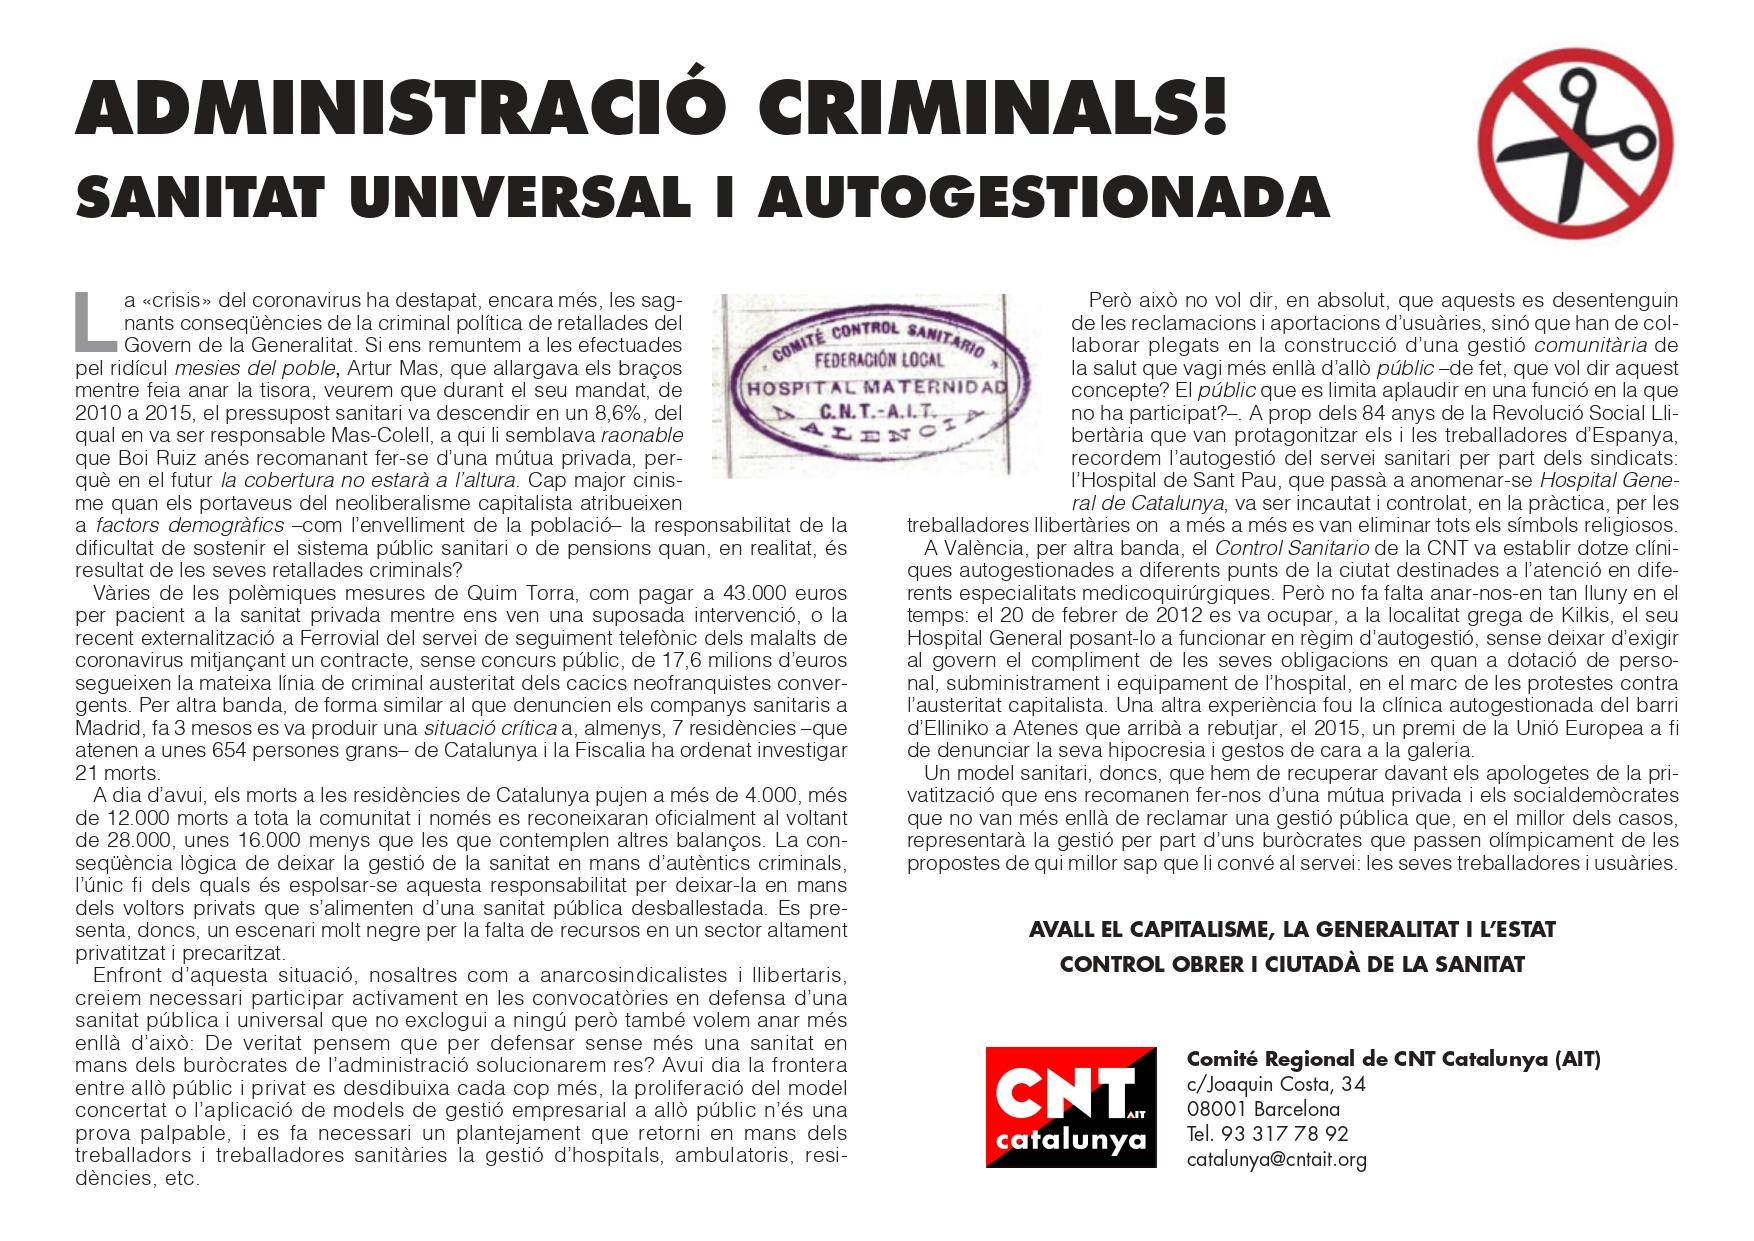 Octaveta Retallades Sanitat (CNT) (catalaÌ)_page-0001.jpg